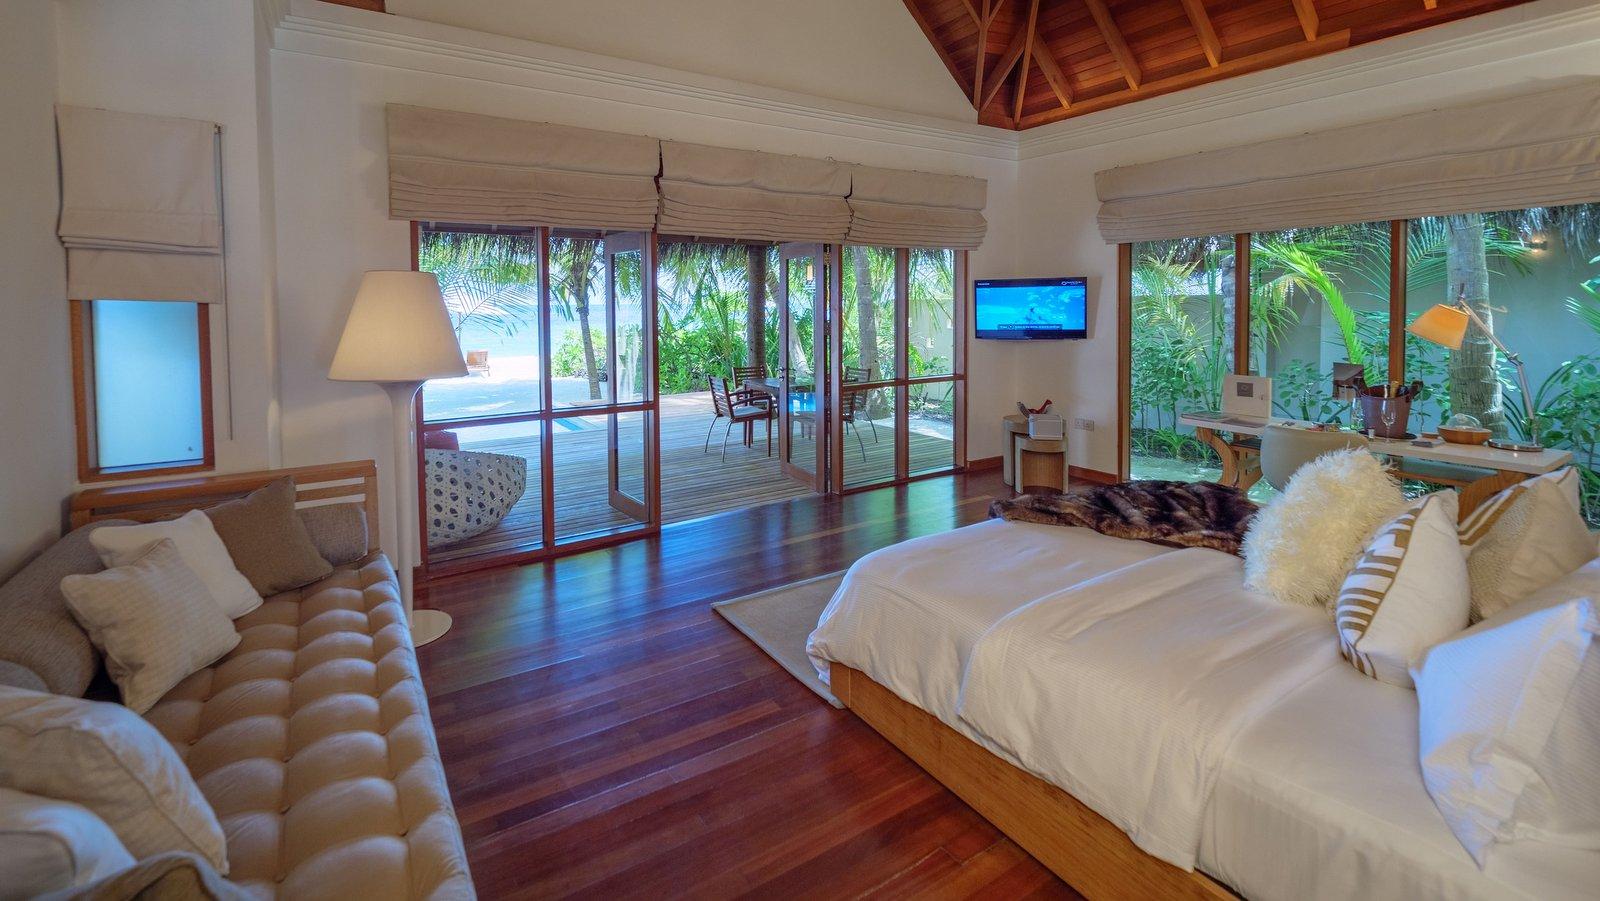 Мальдивы, отель Huvafen Fushi Maldives, номер Deluxe Beach Bungalow with Pool